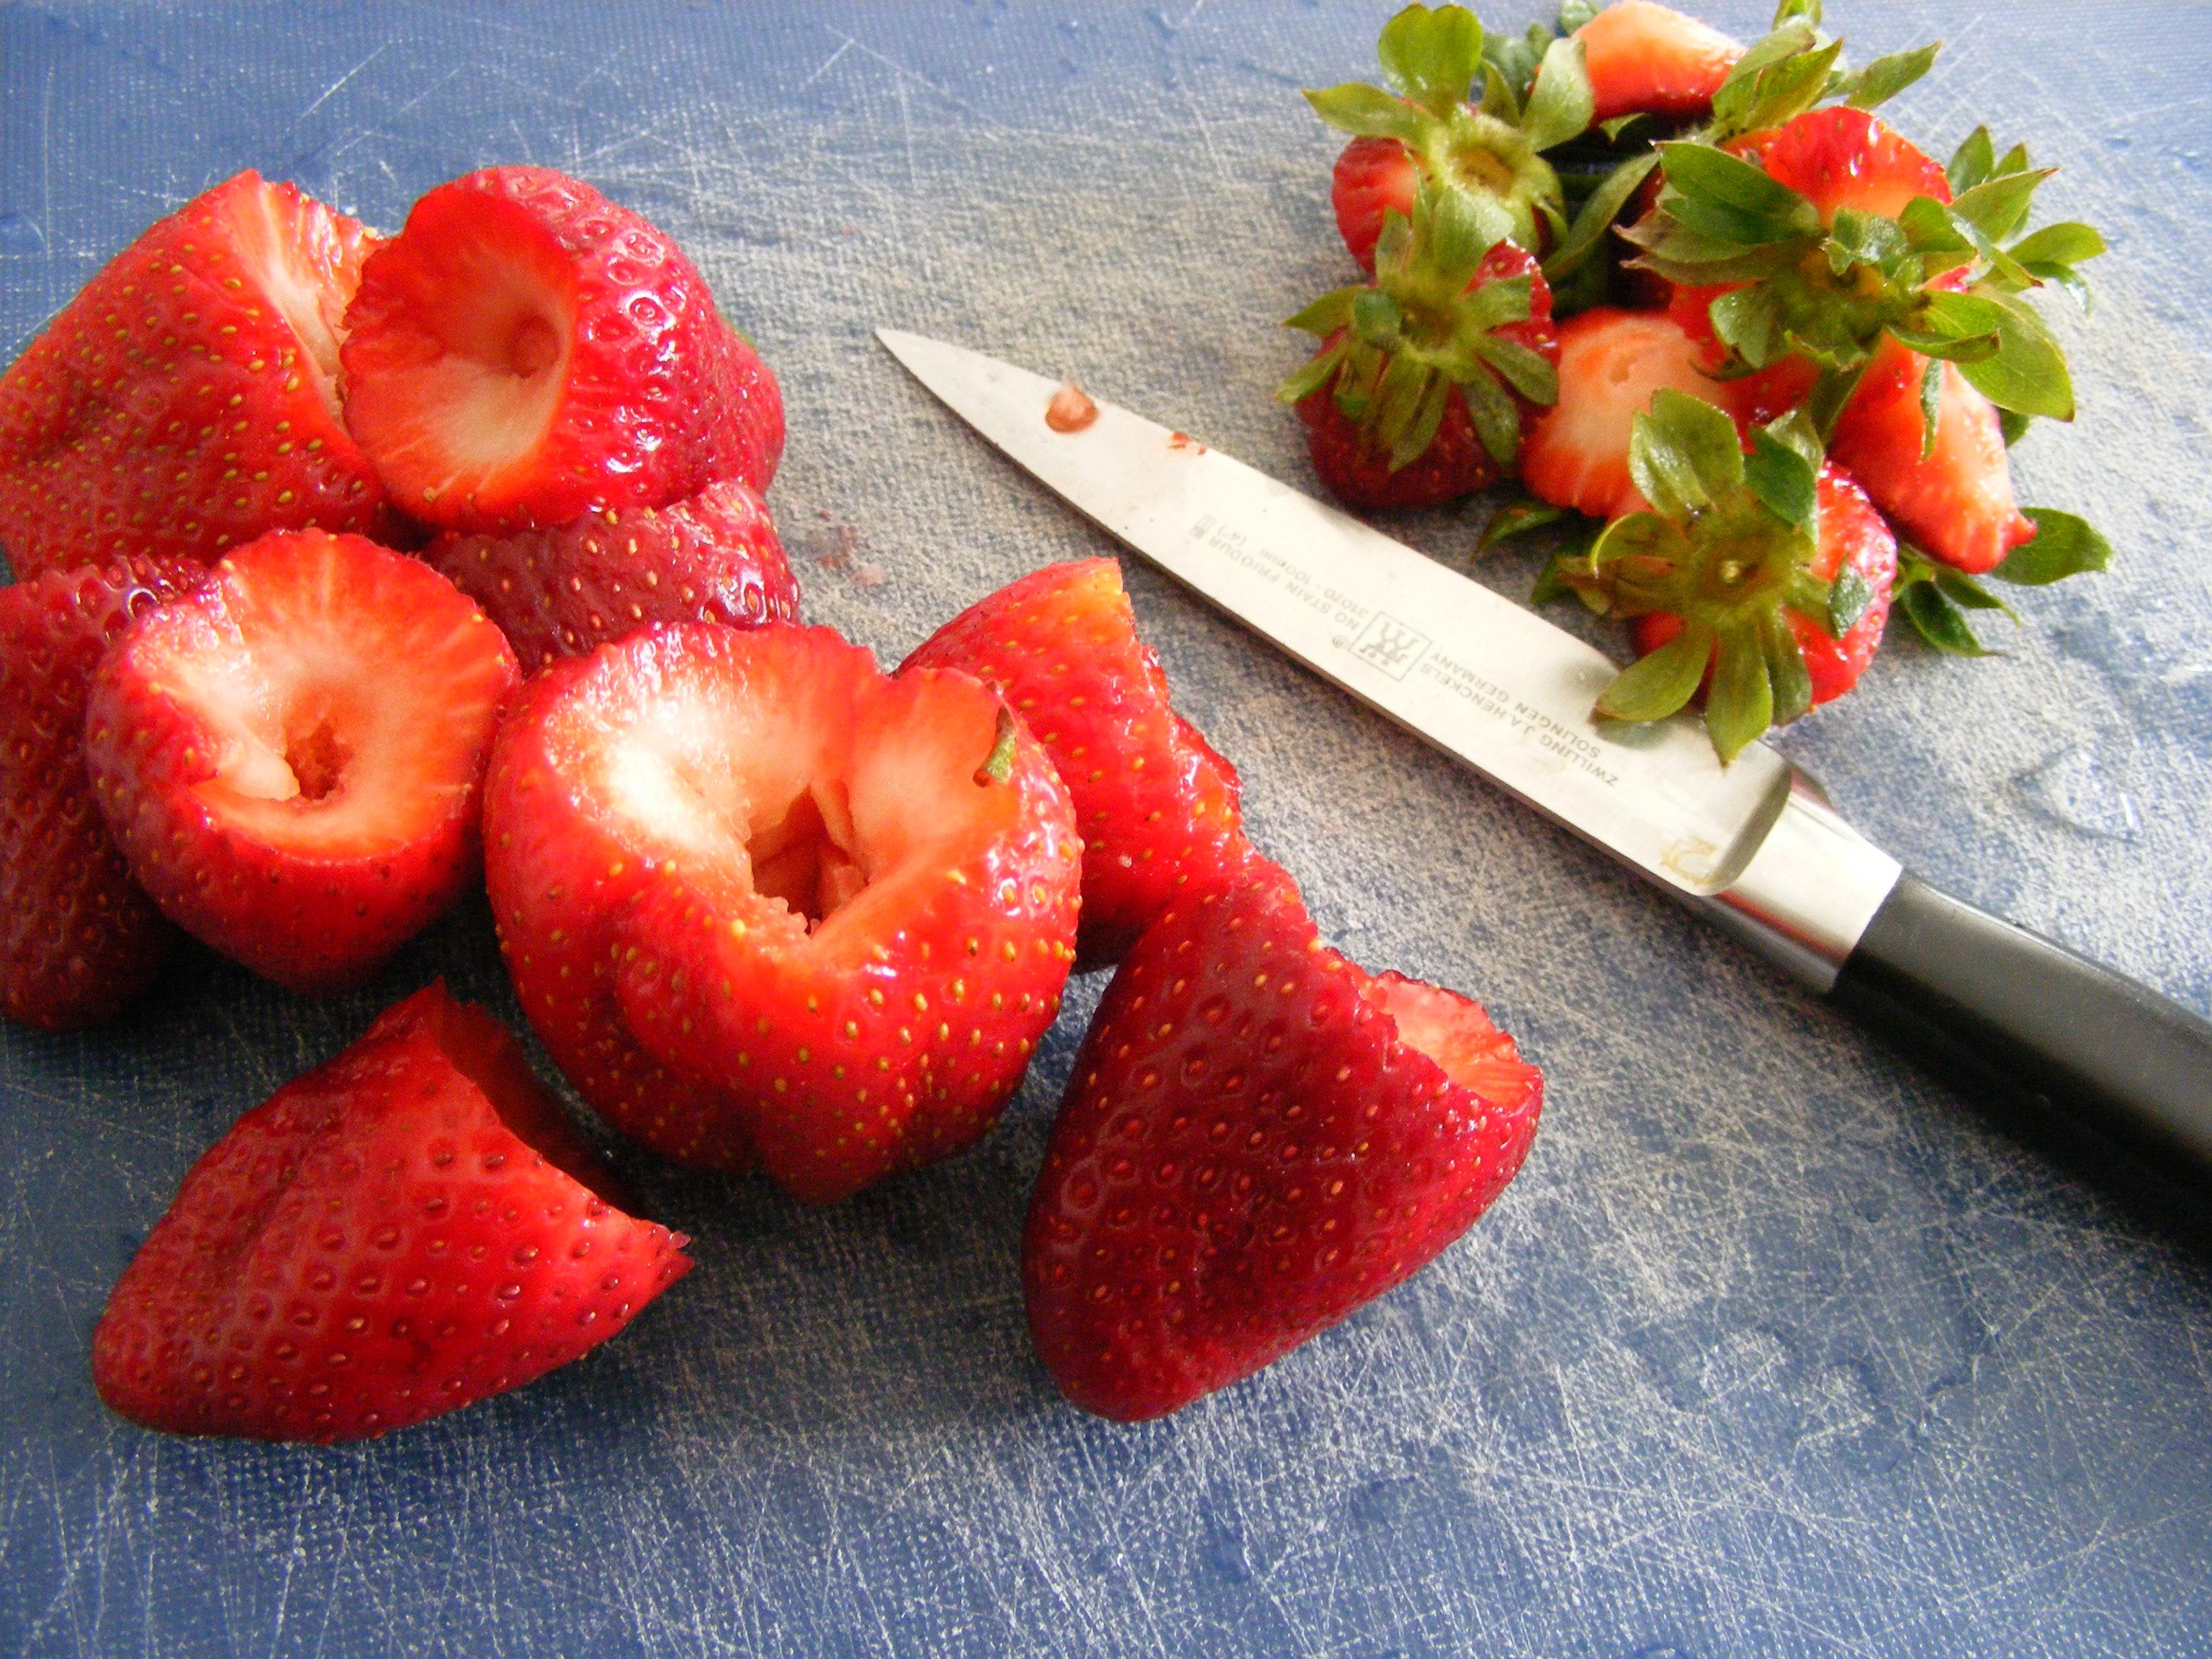 Make a Fruit Smoothie